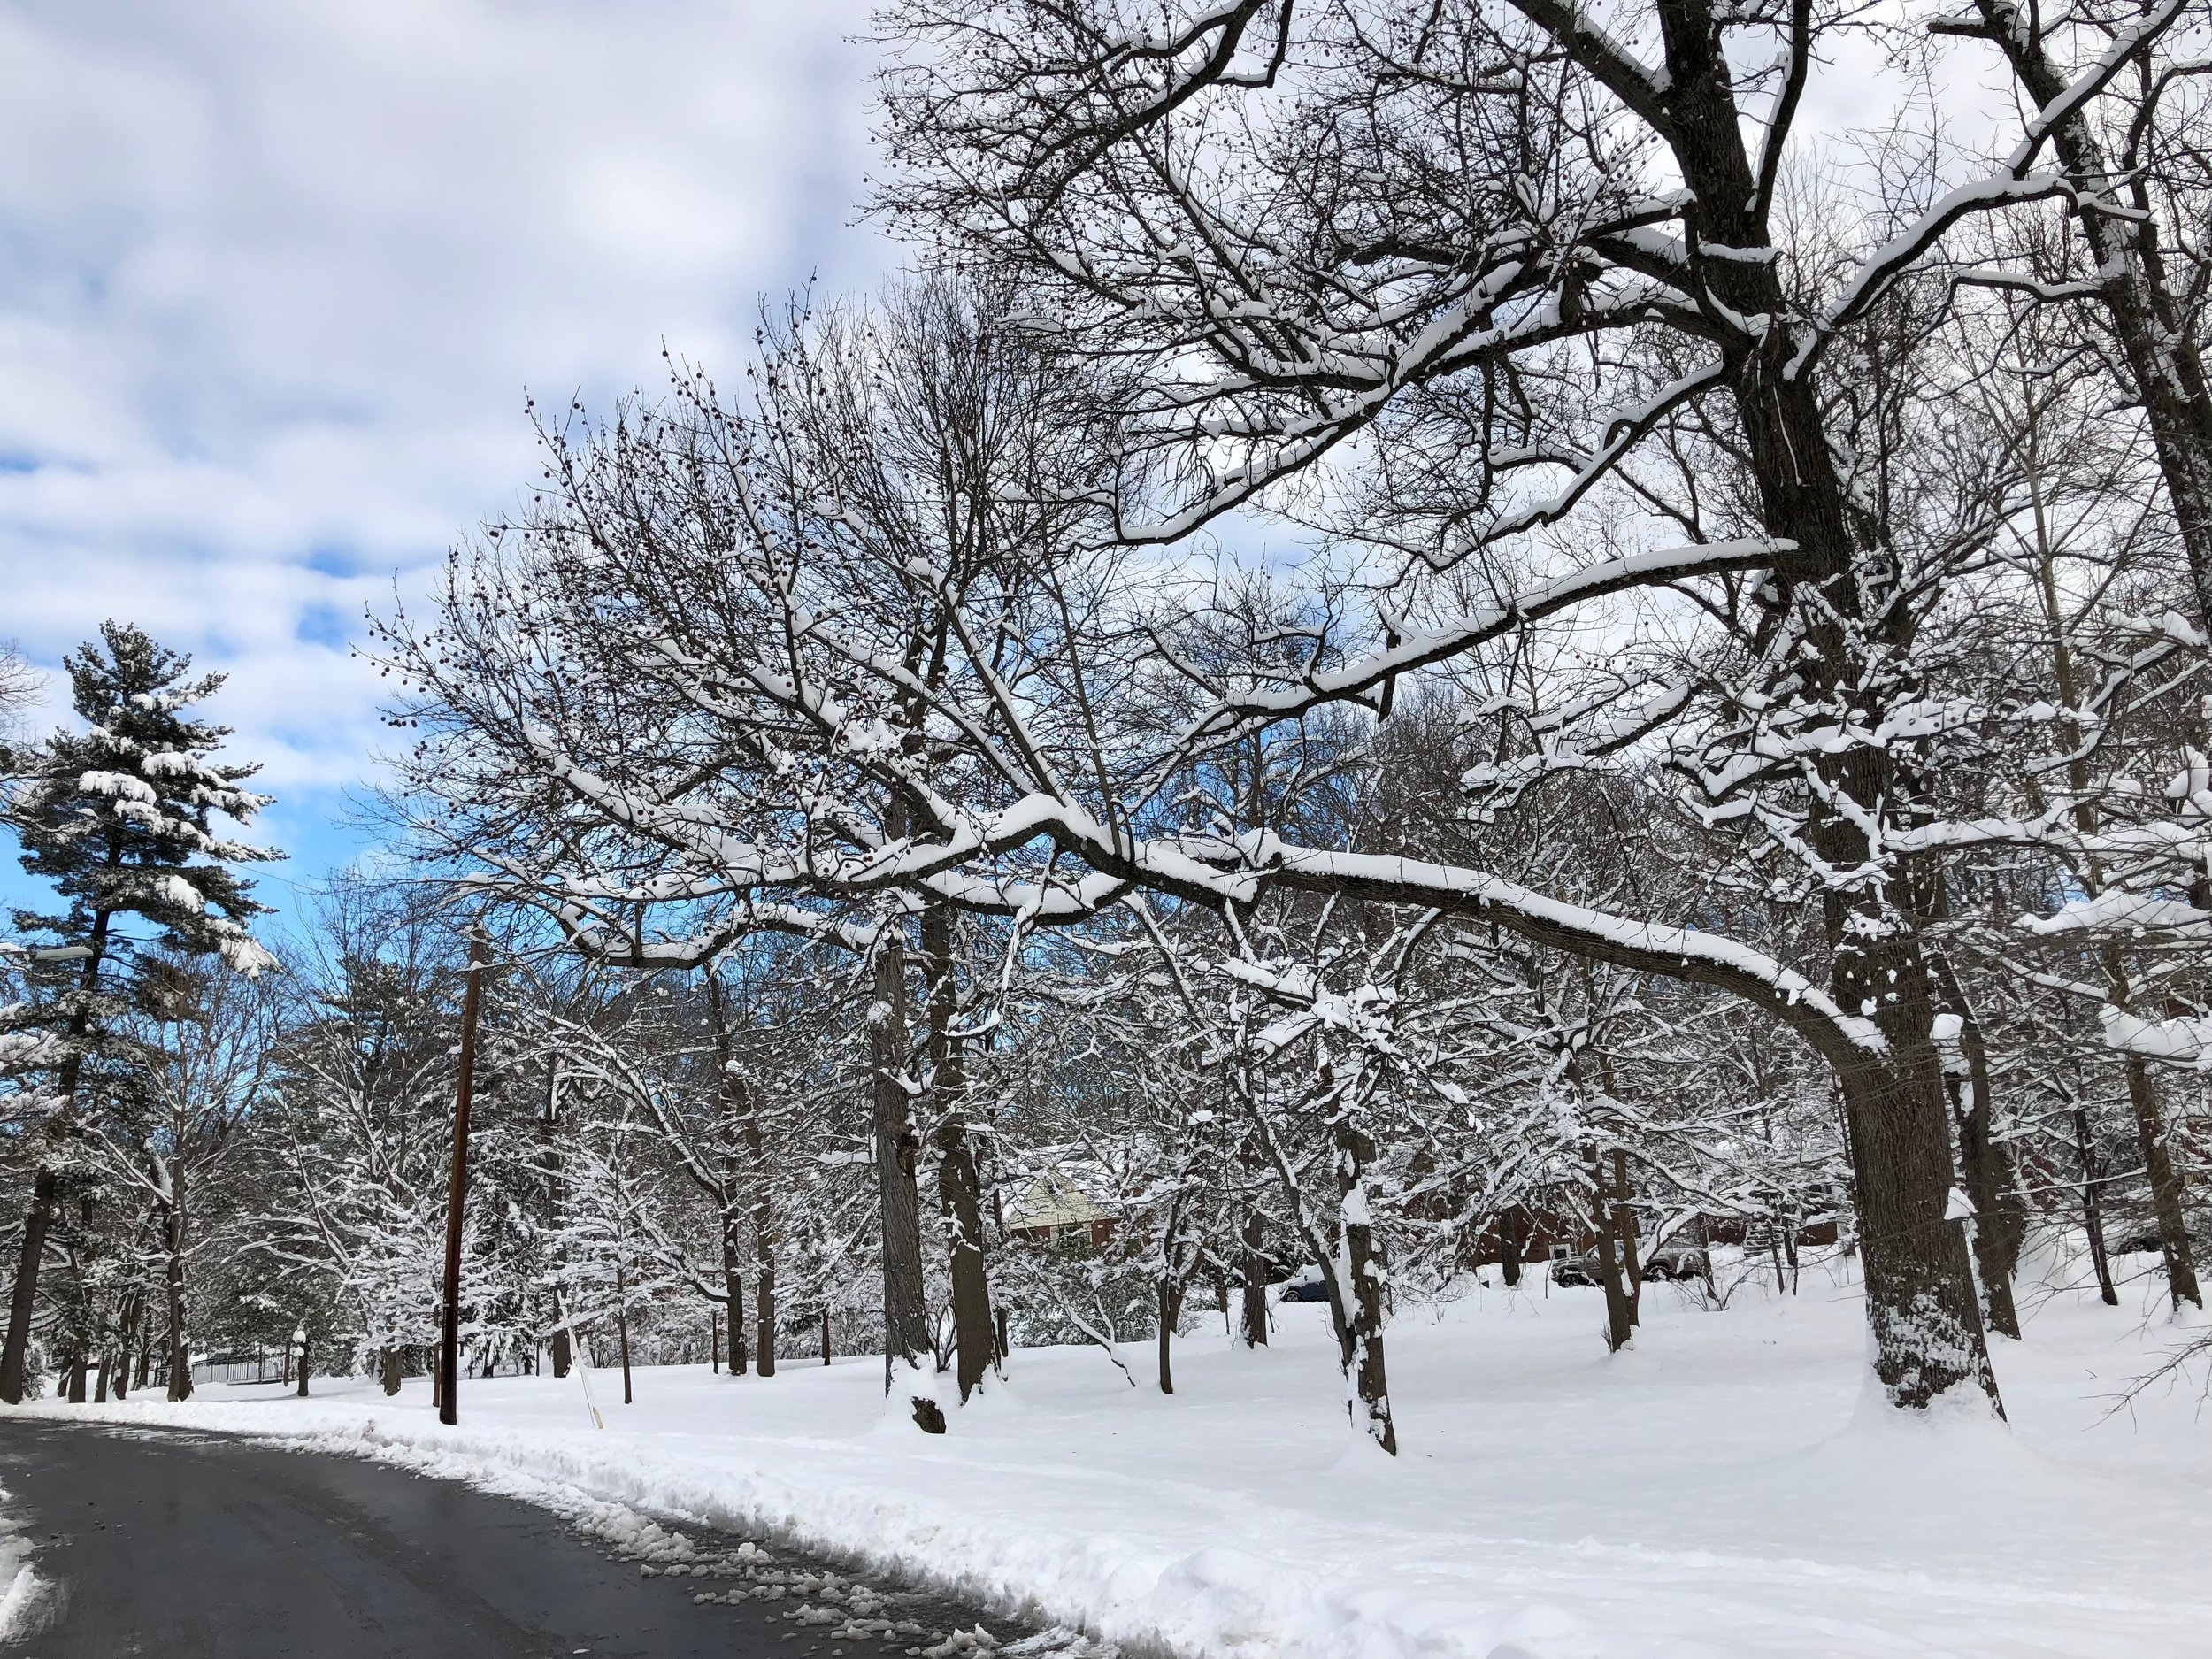 Quiet snow, January 2019